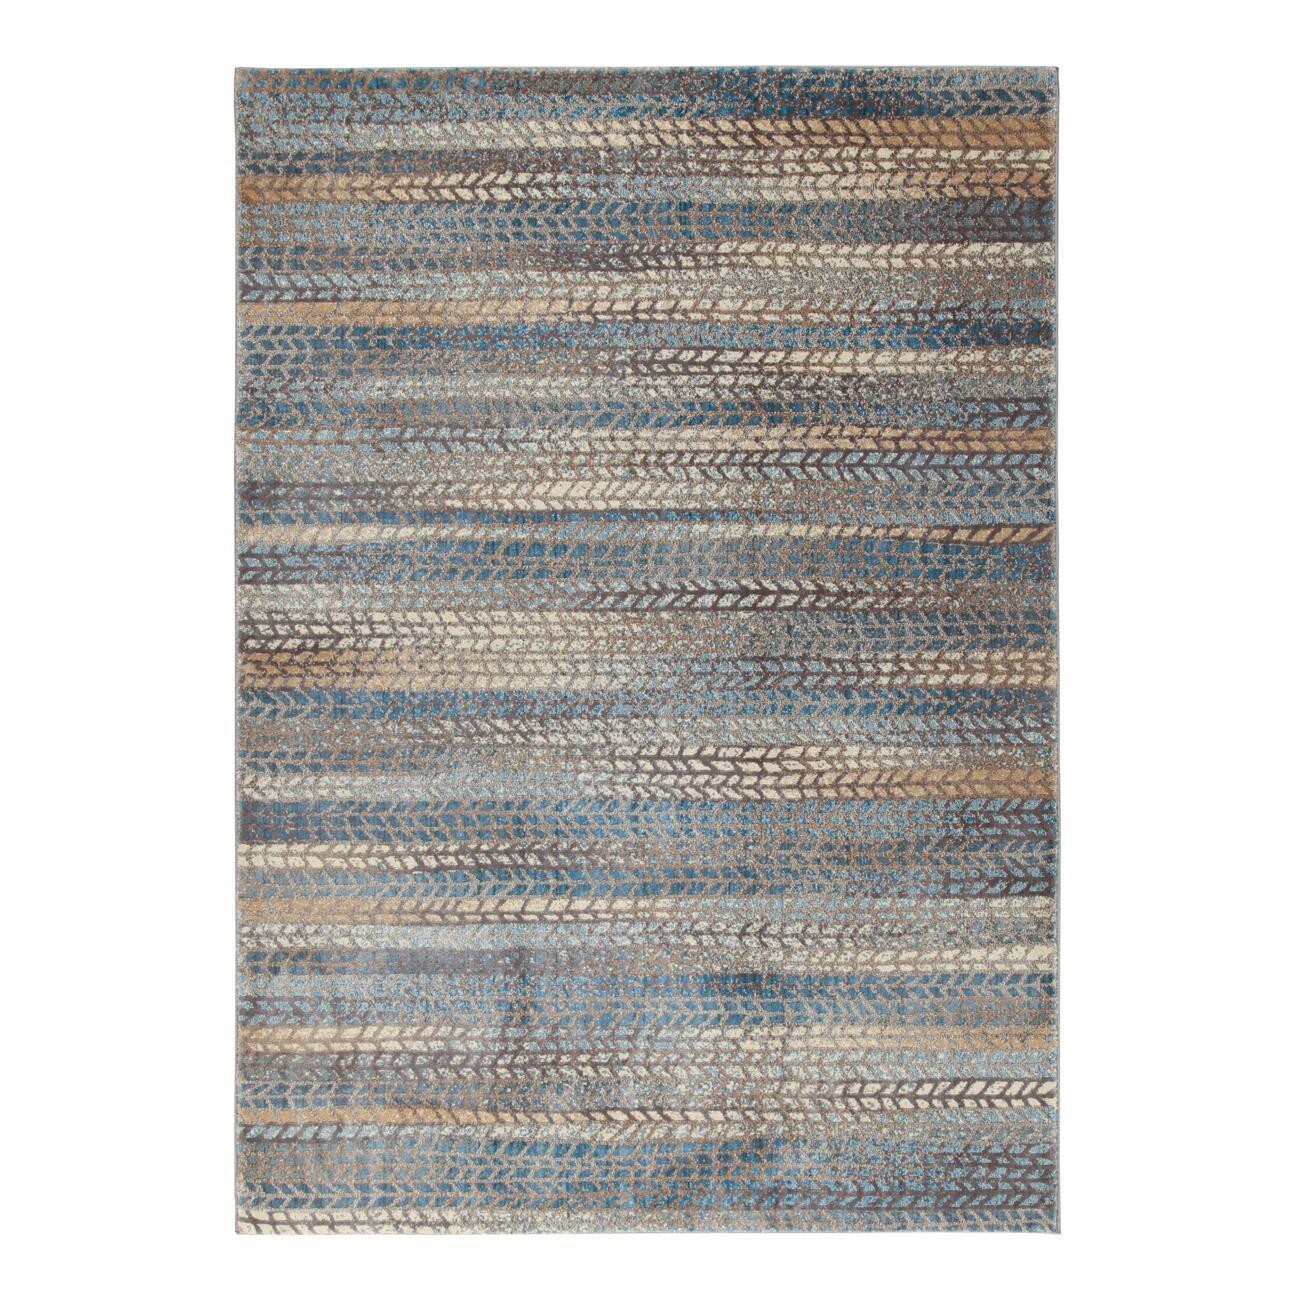 Tappeto Four seasons , blu scuro, 160x220 - 2